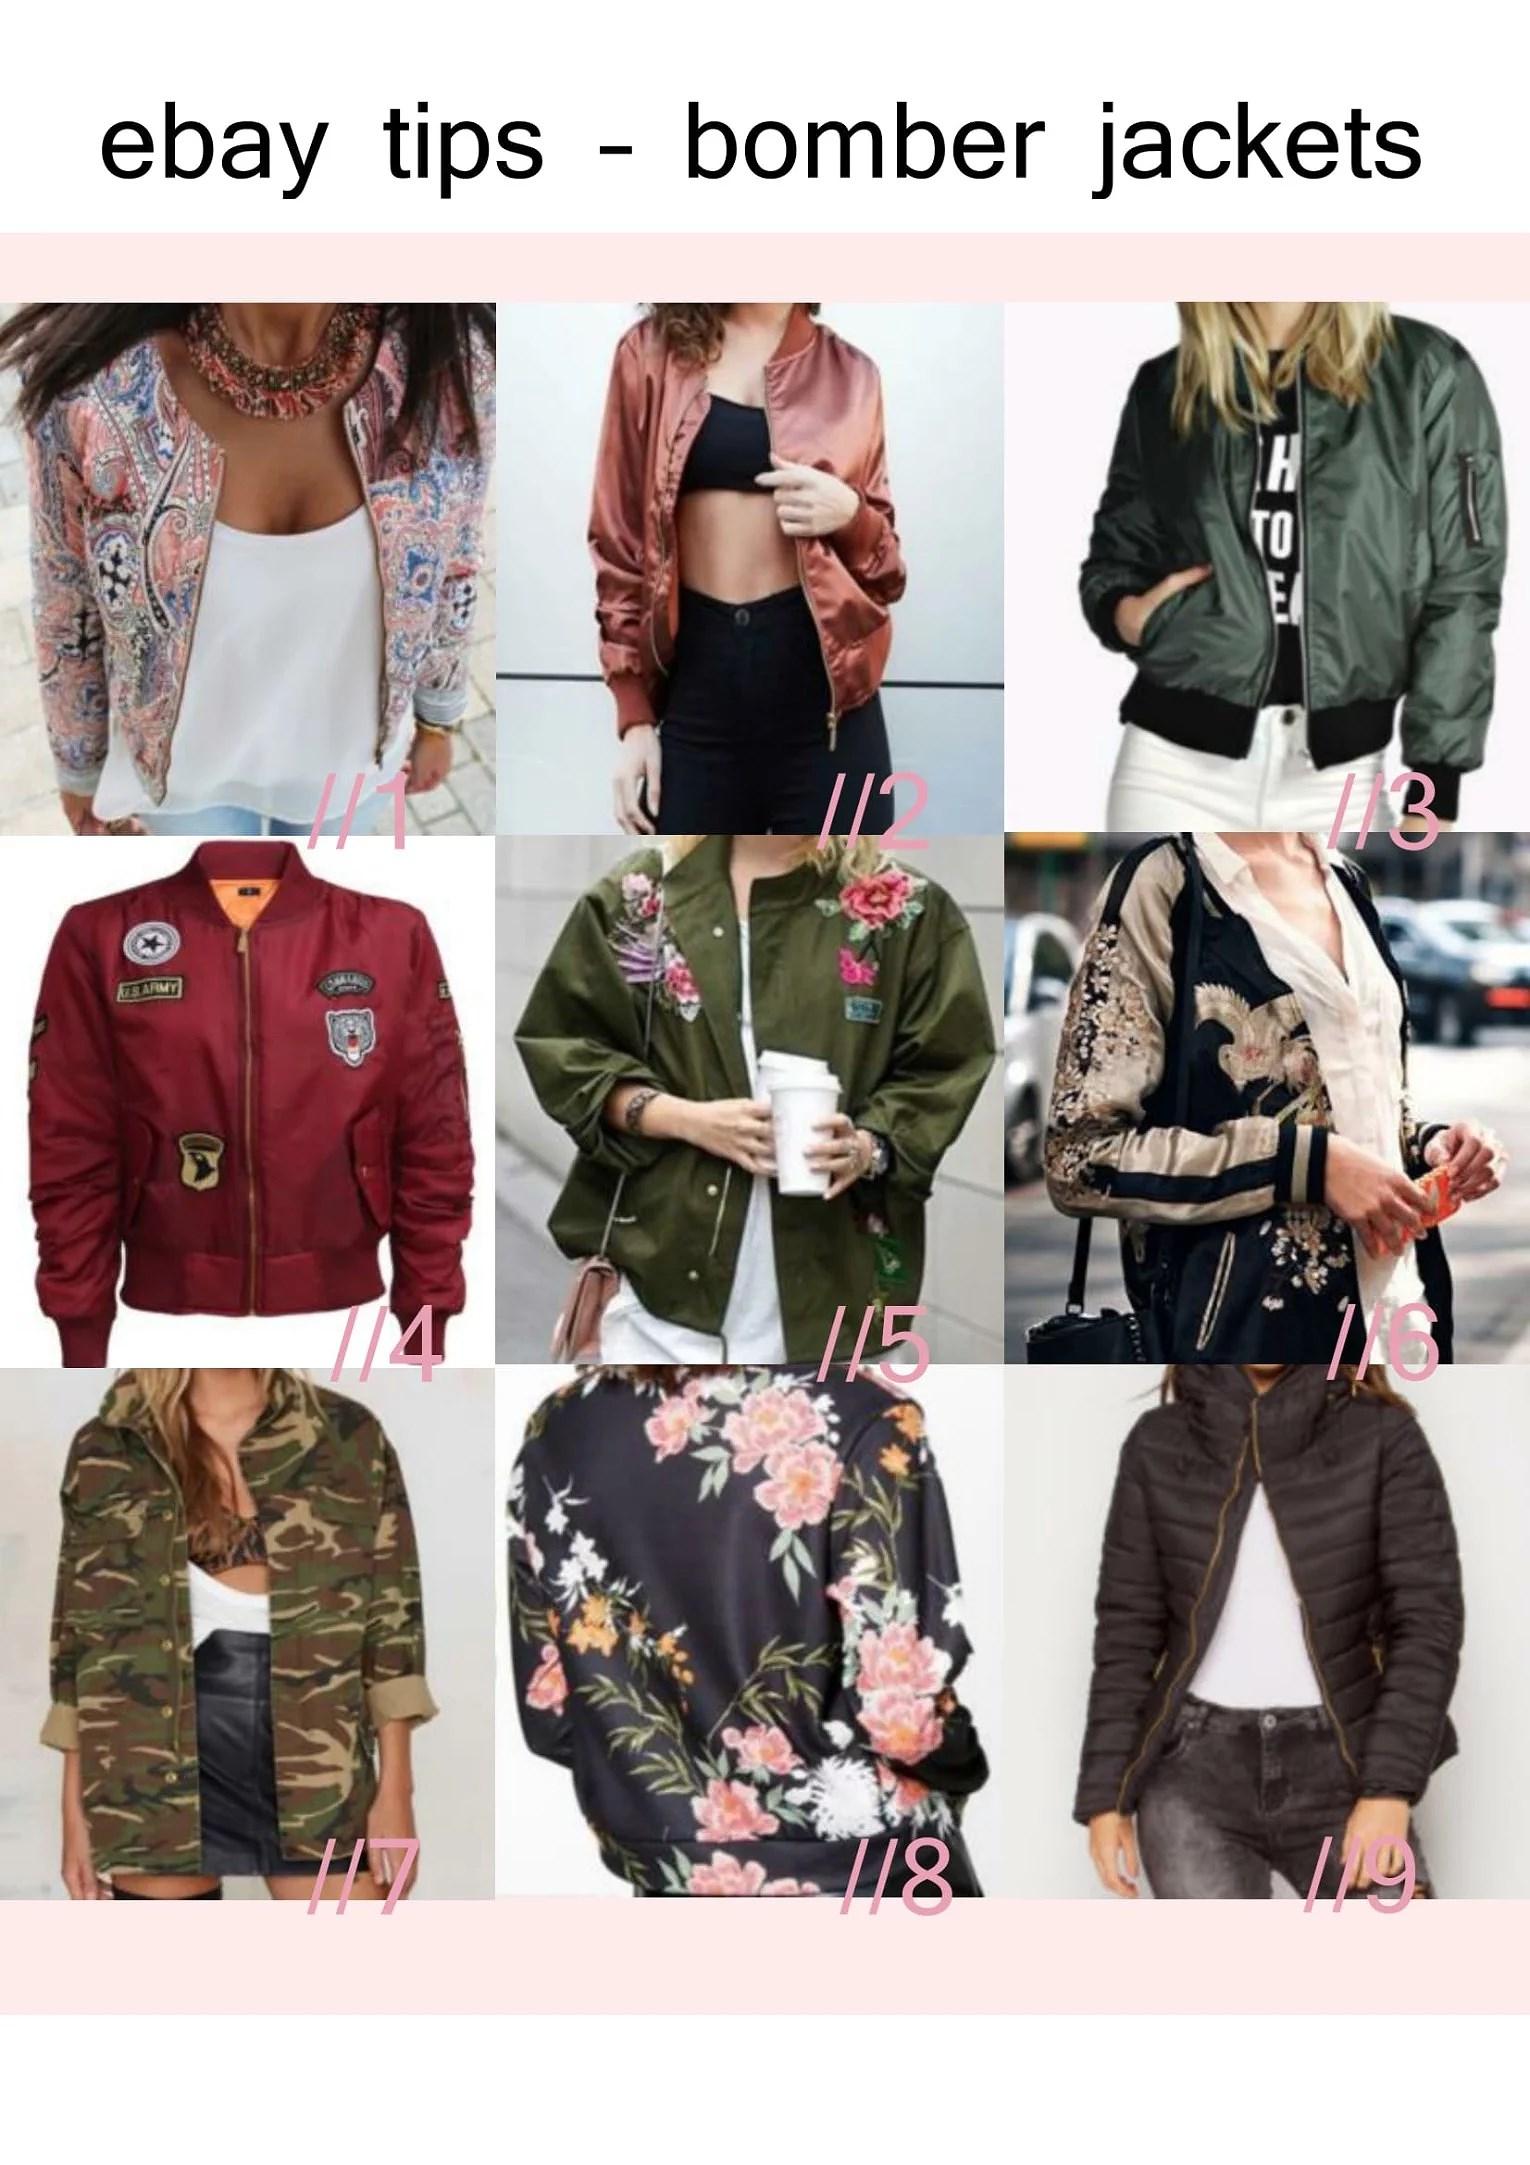 eBay tip - bomber jackets